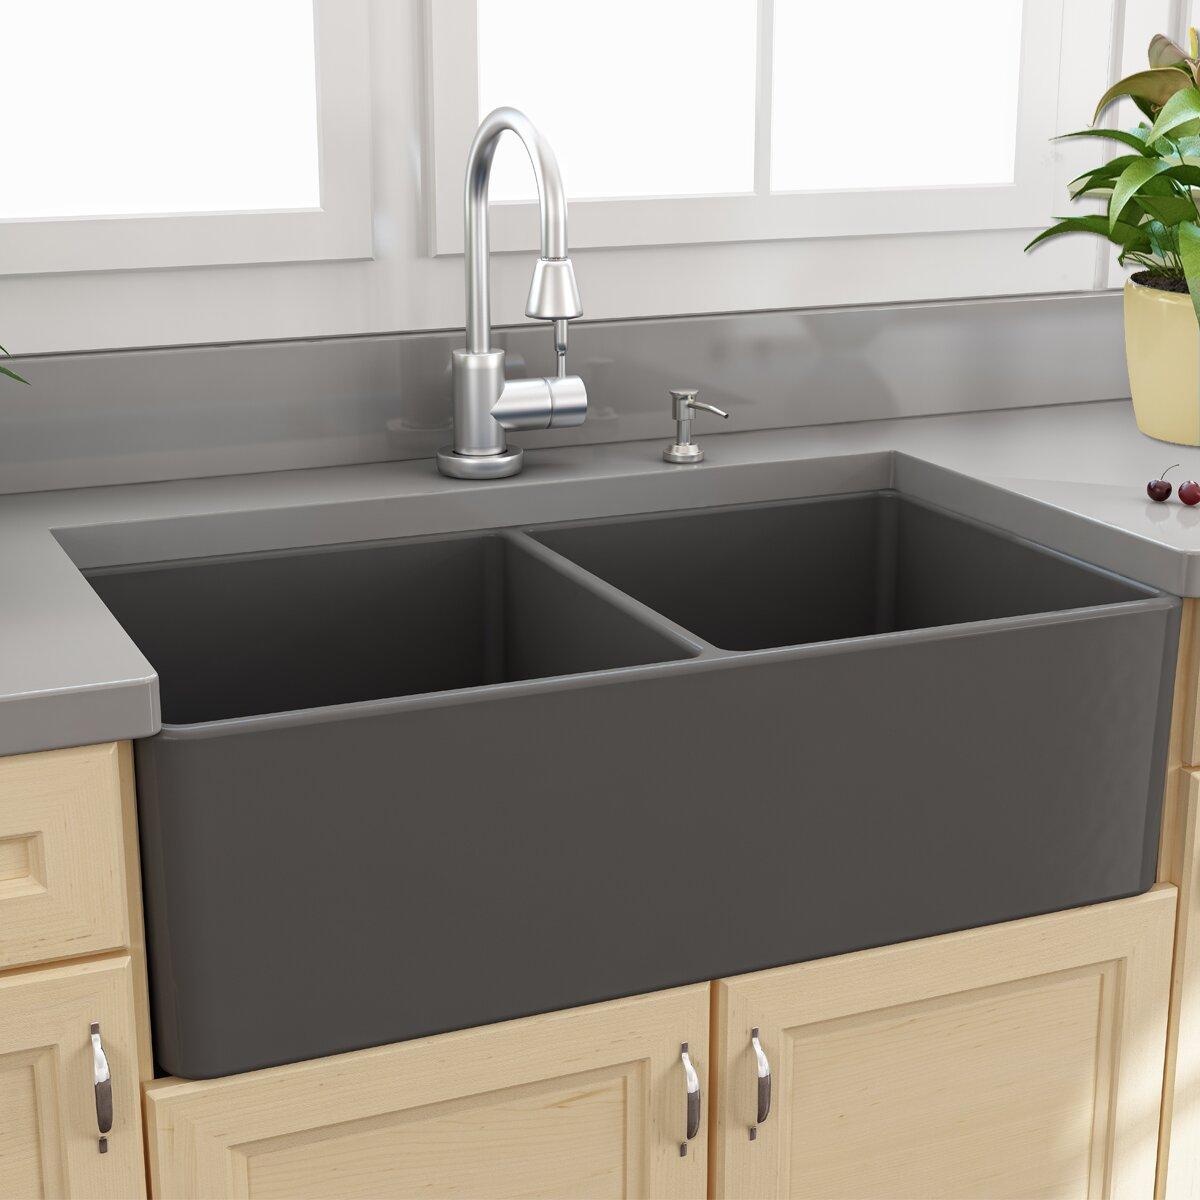 Nantucket  Double Bowl Gray Fireclay Kitchen Sink